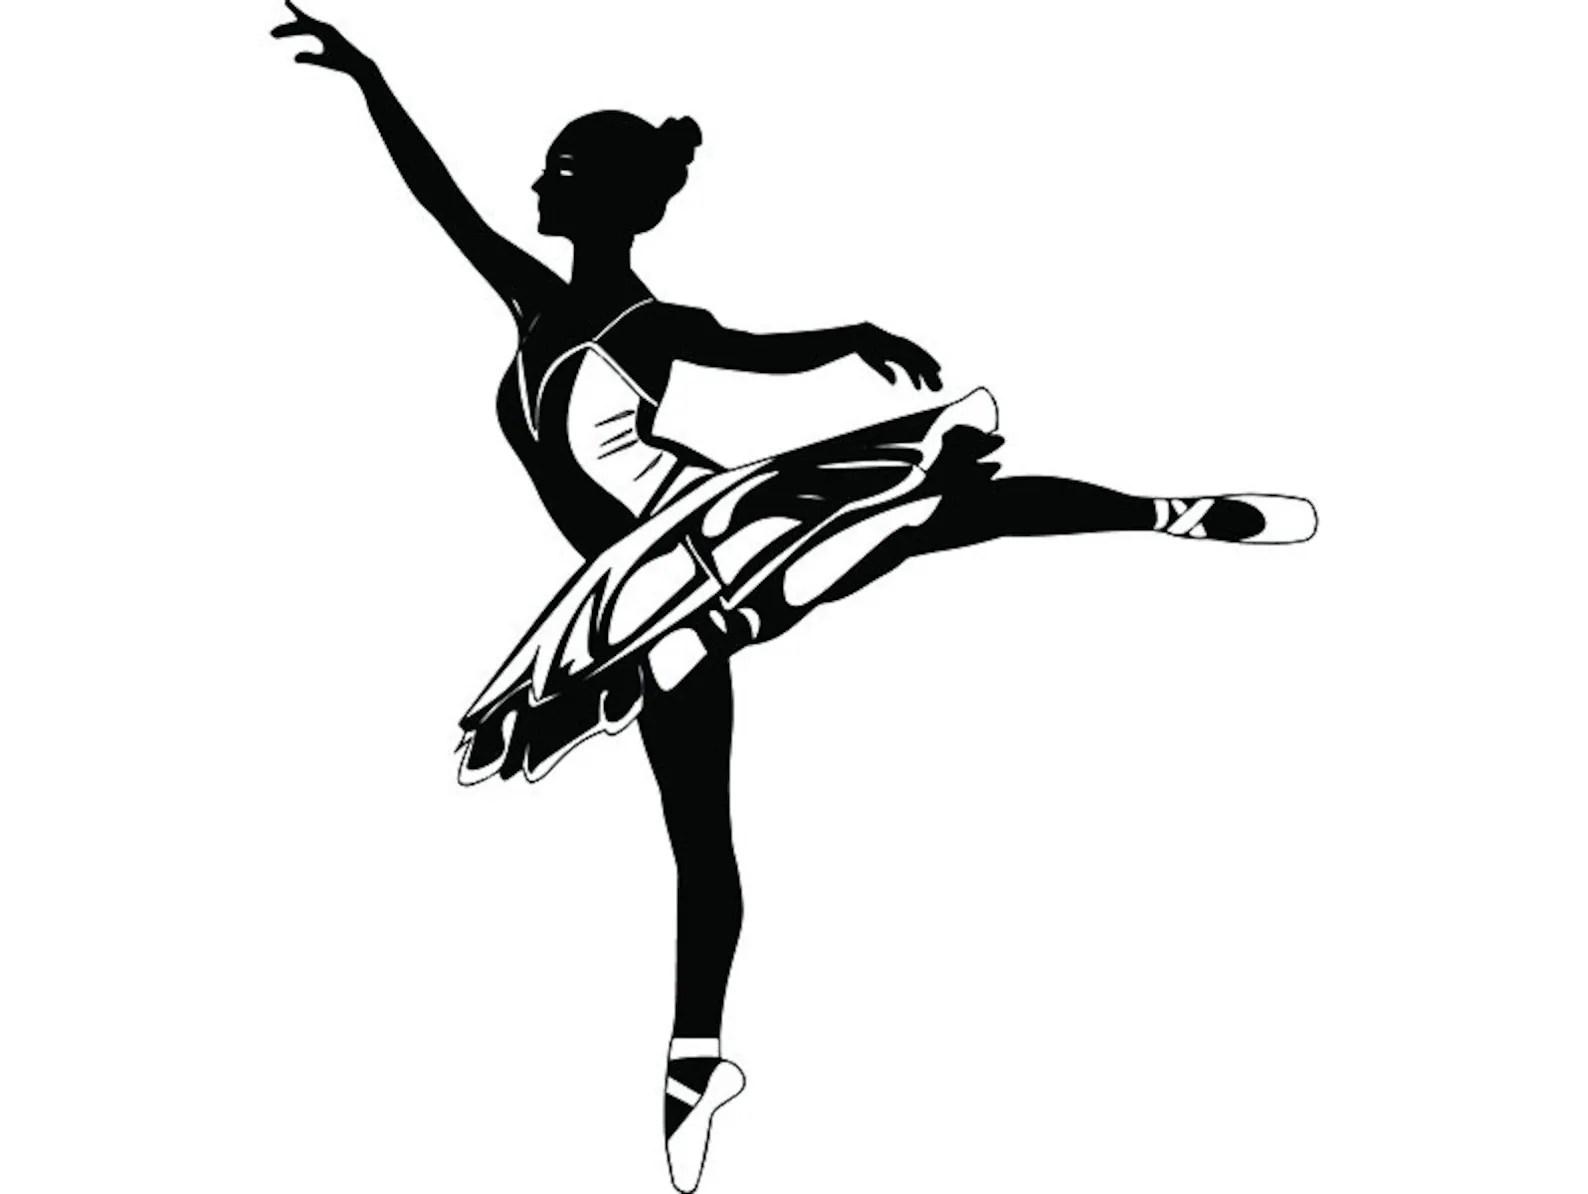 hight resolution of ballet dancer 2 ballerina music dance performance dancing dancer classical grace logo svg png clipart vector